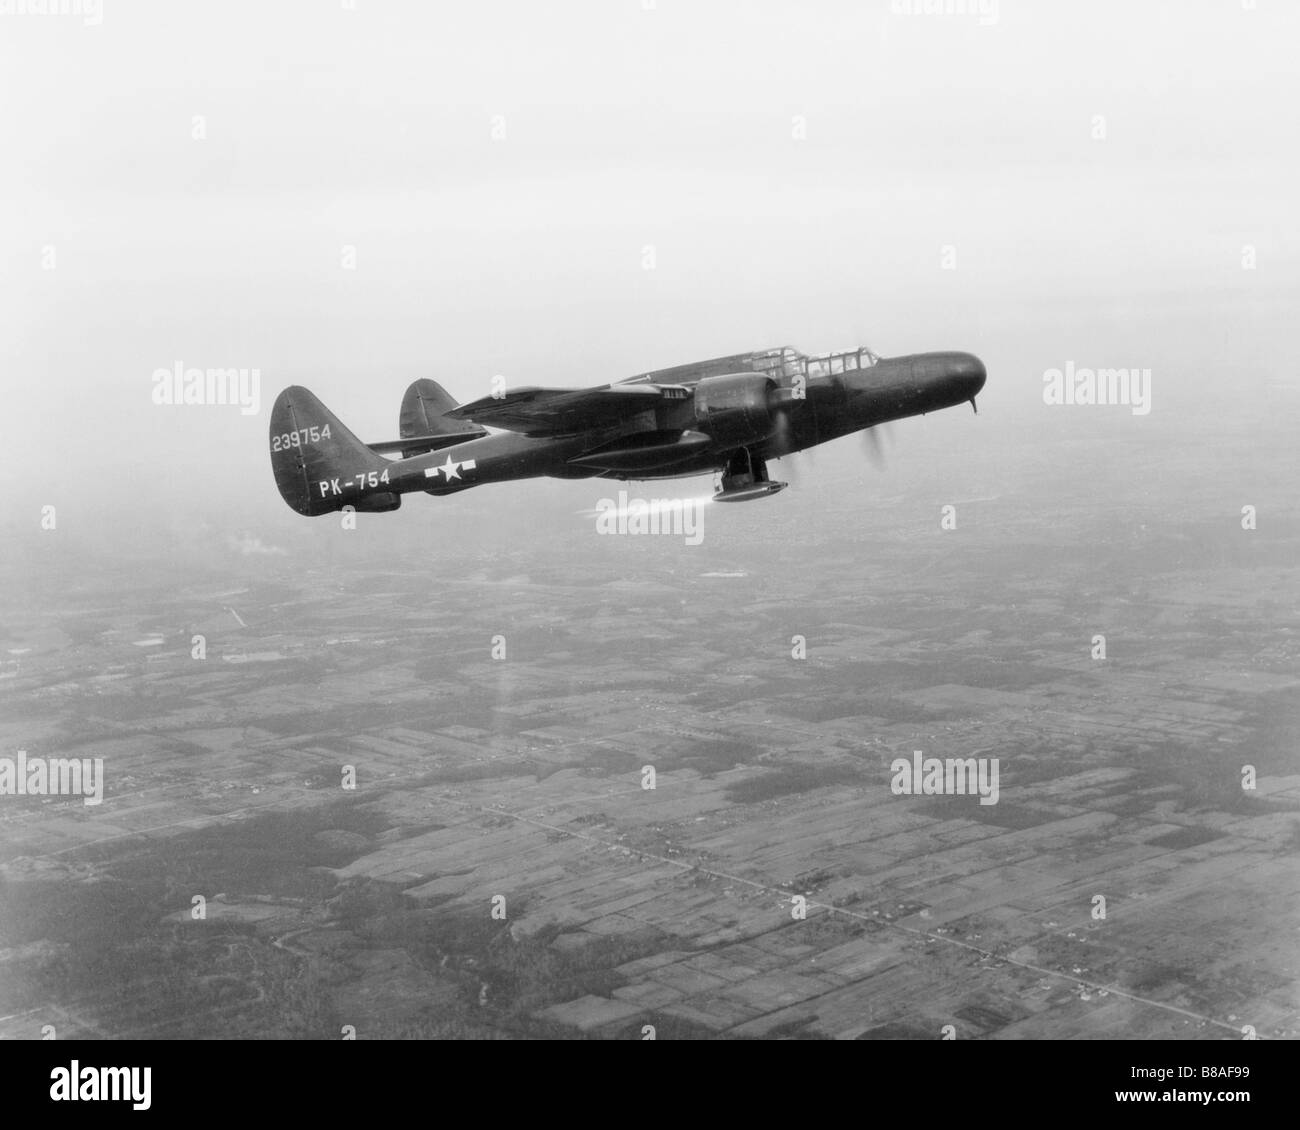 P-61 Flight Testing Ramjet Engine - Stock Image